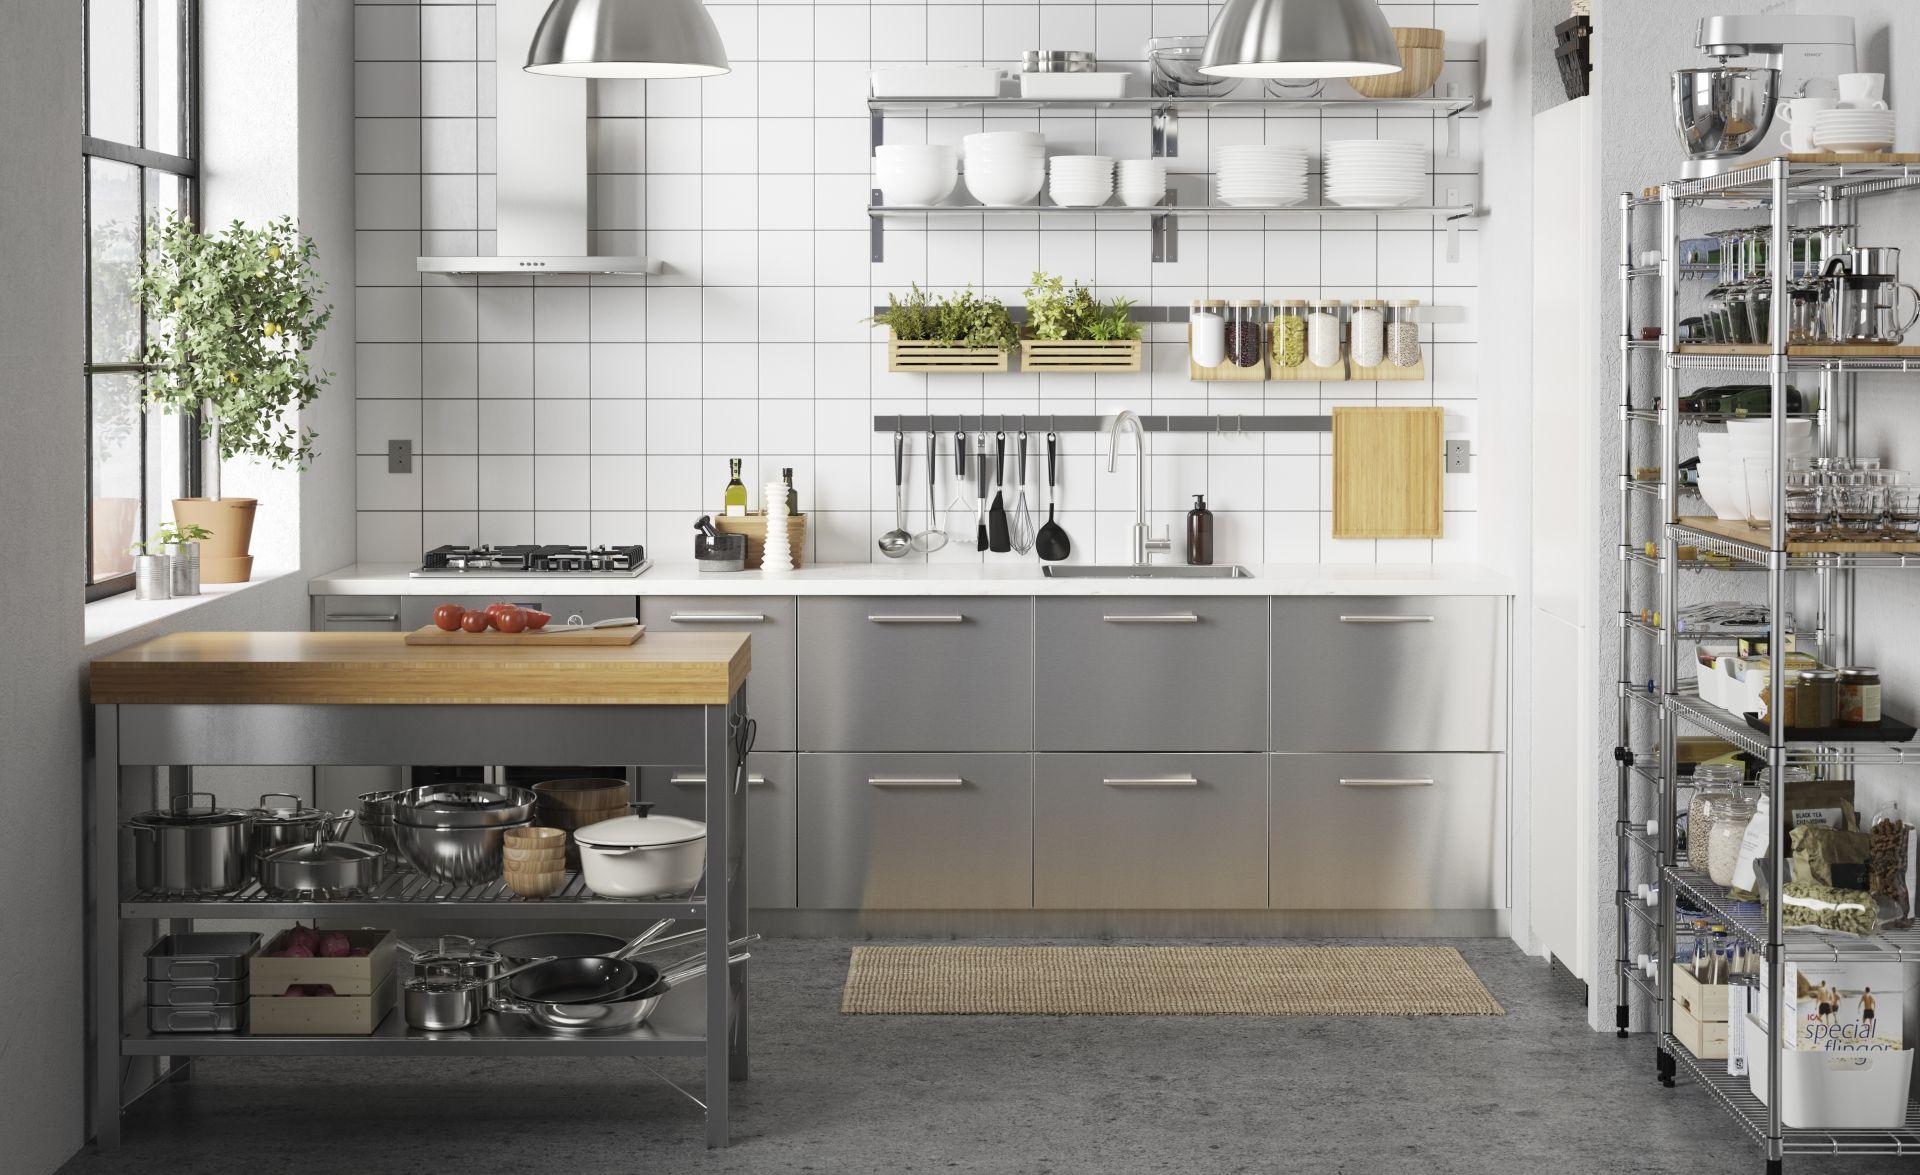 Opbergers Ikea Keuken : Ikea opbergers keuken u informatie over de keuken